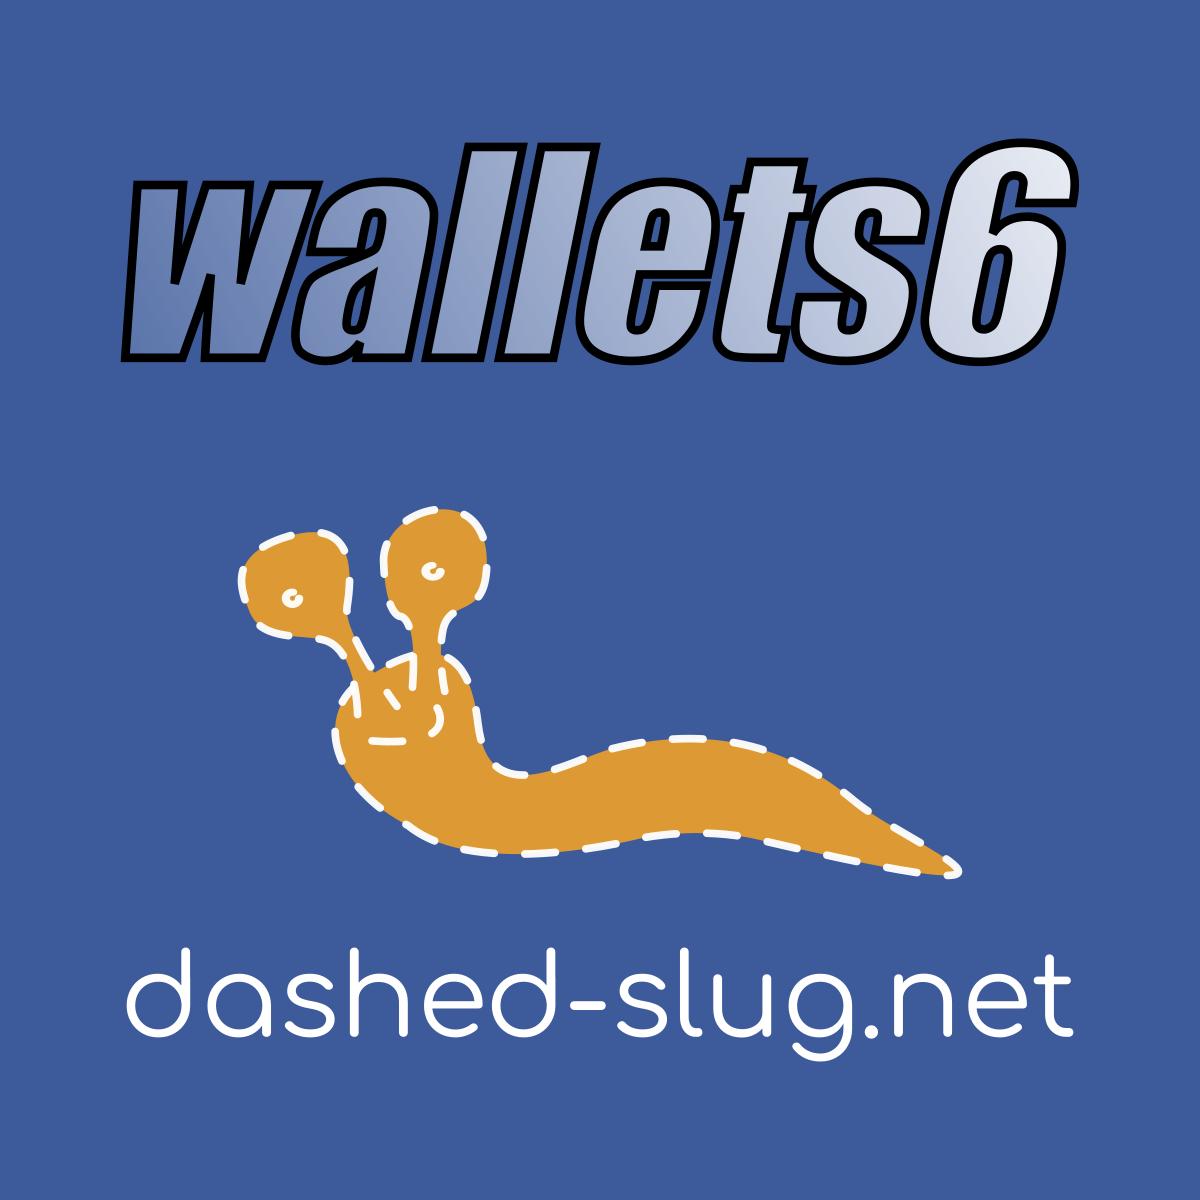 wallets6 dashed-slug.net